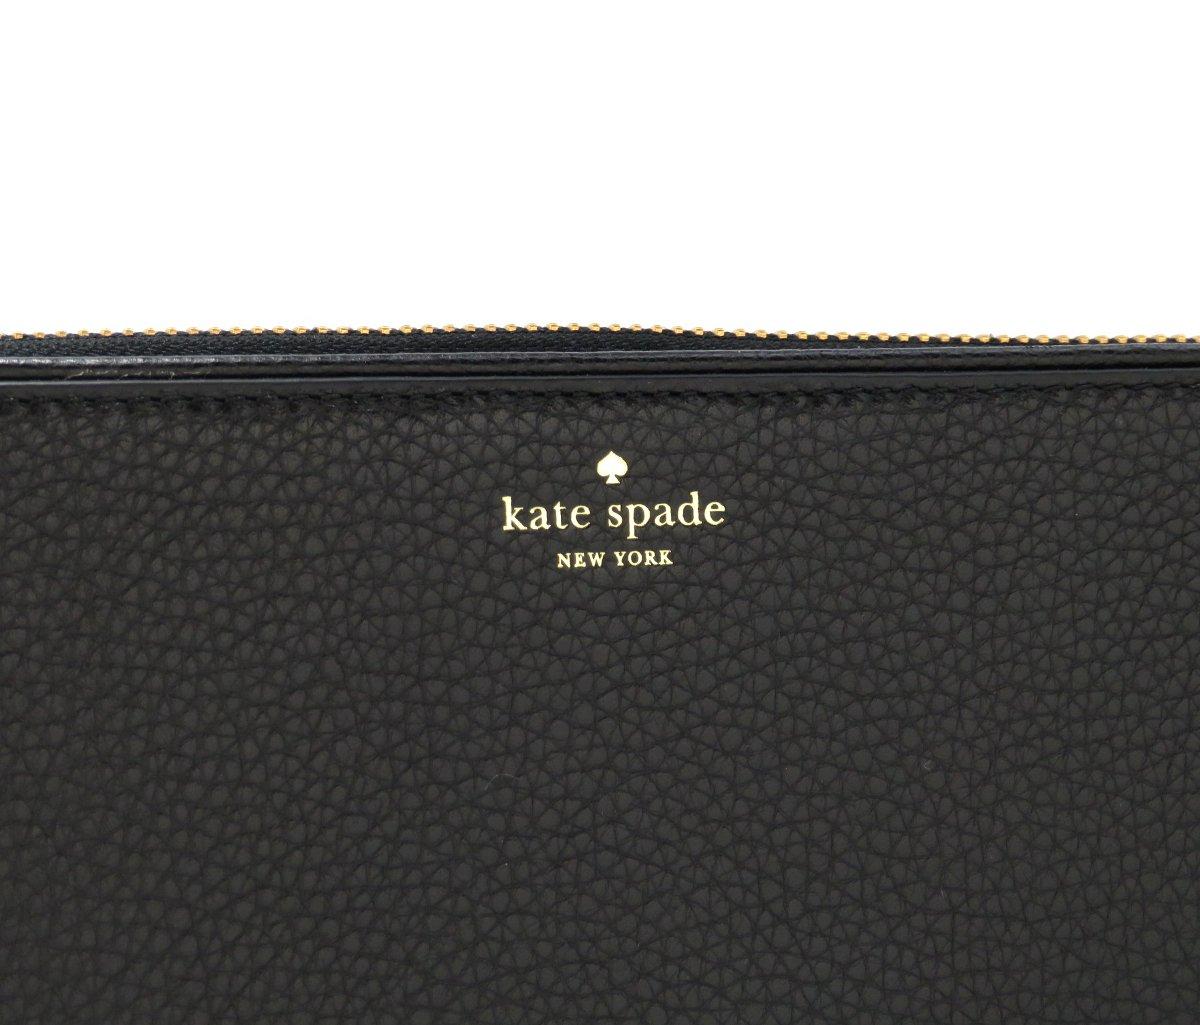 Kate Spade New York Mulberry Street Brigitta Wristlet Wallet Handbag (Black) by Kate Spade New York (Image #6)